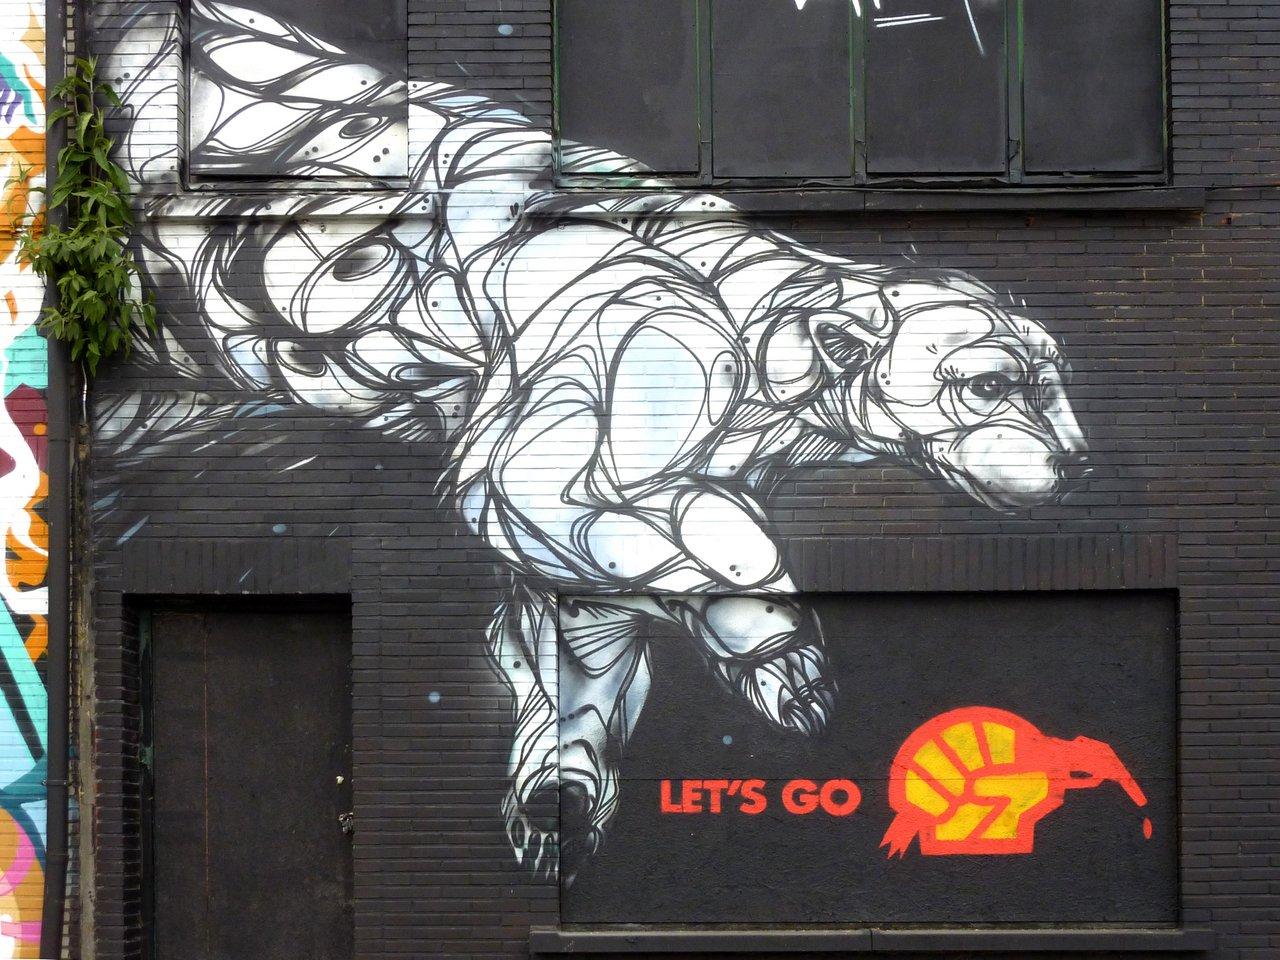 graffiti di anversa e street art: Orso polare di Dzia a New Zuremborg